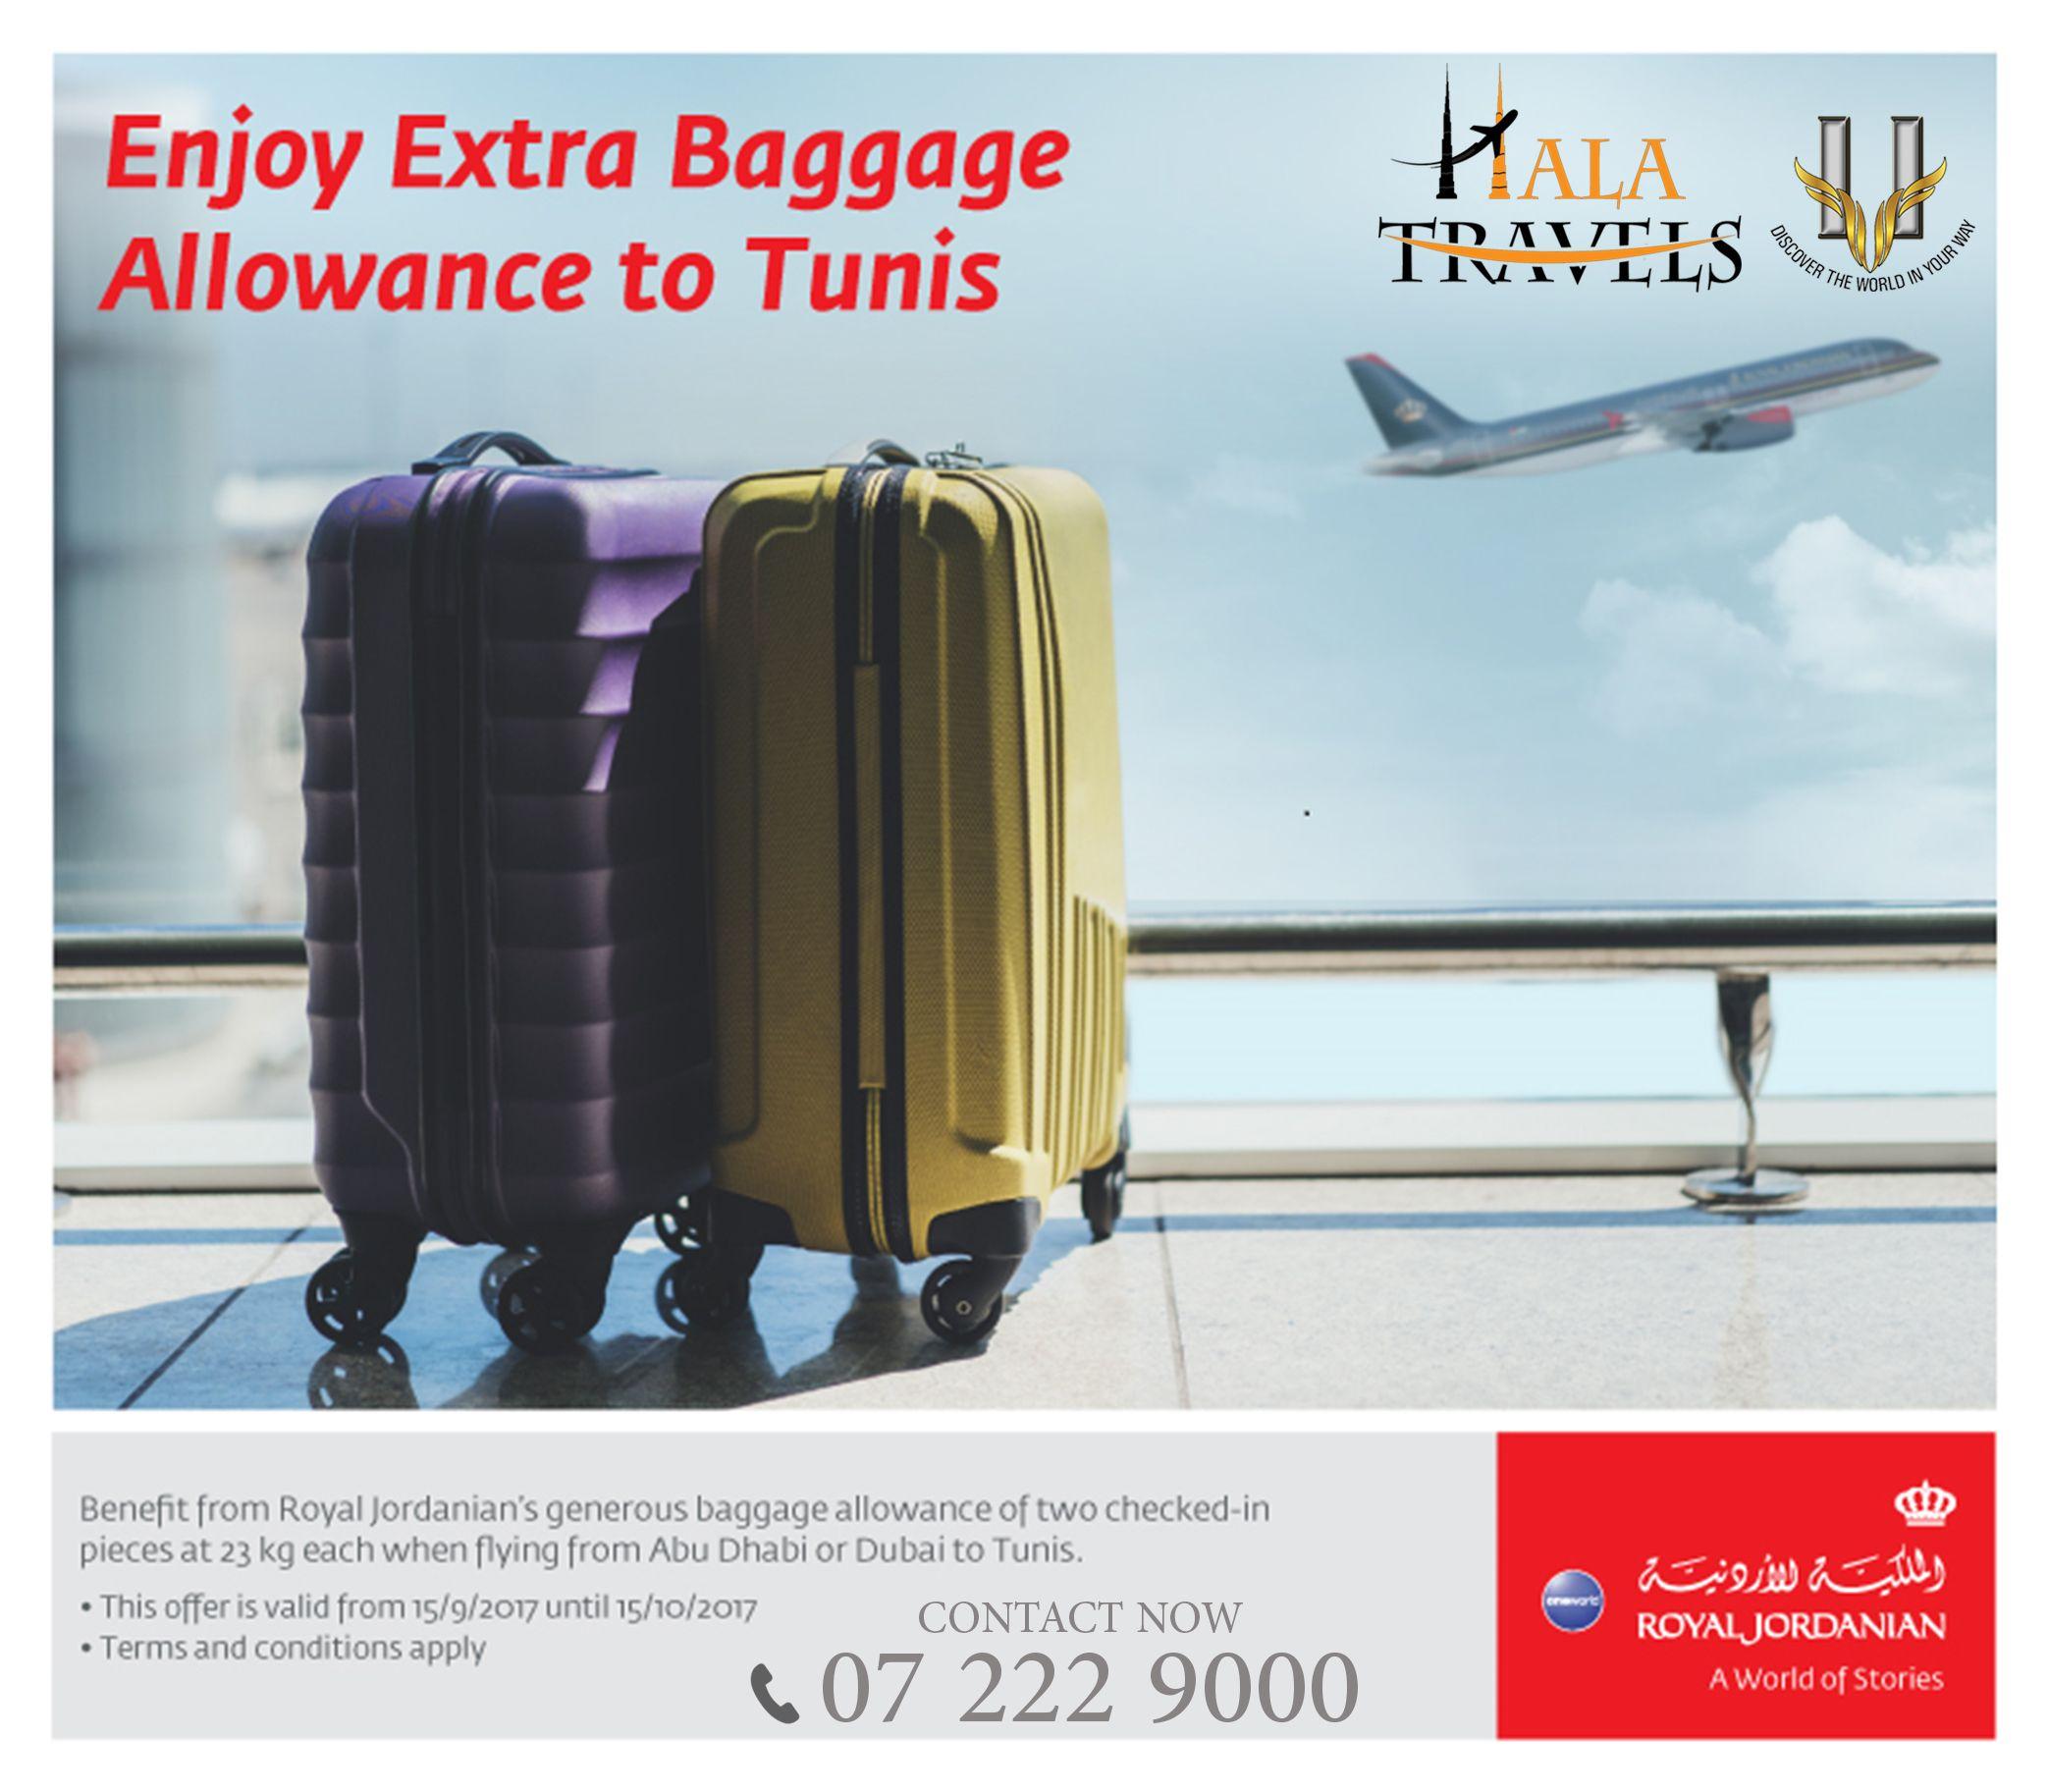 air jordanian baggage allowance